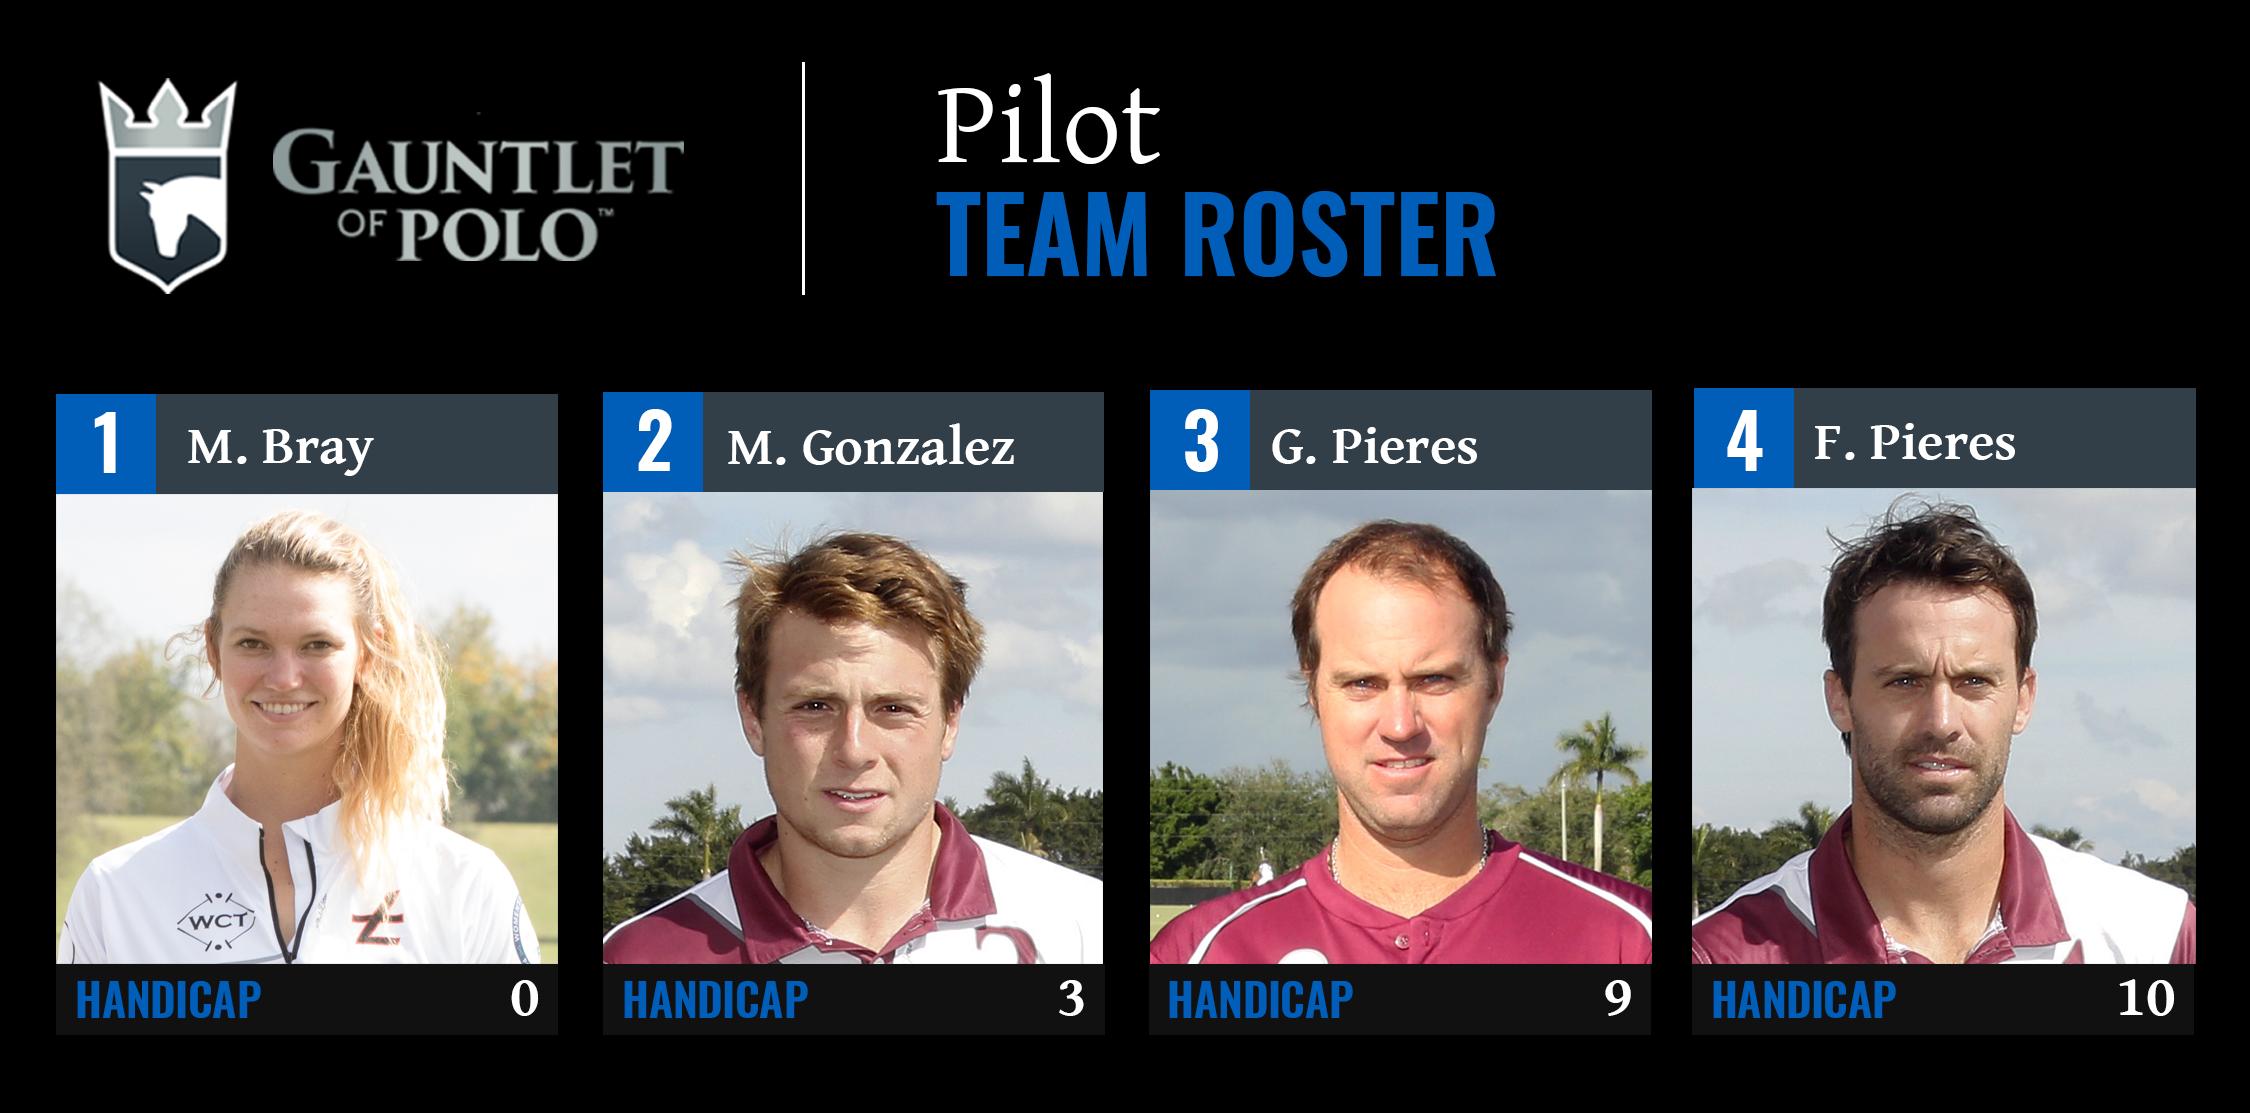 Team Roster- Pilot